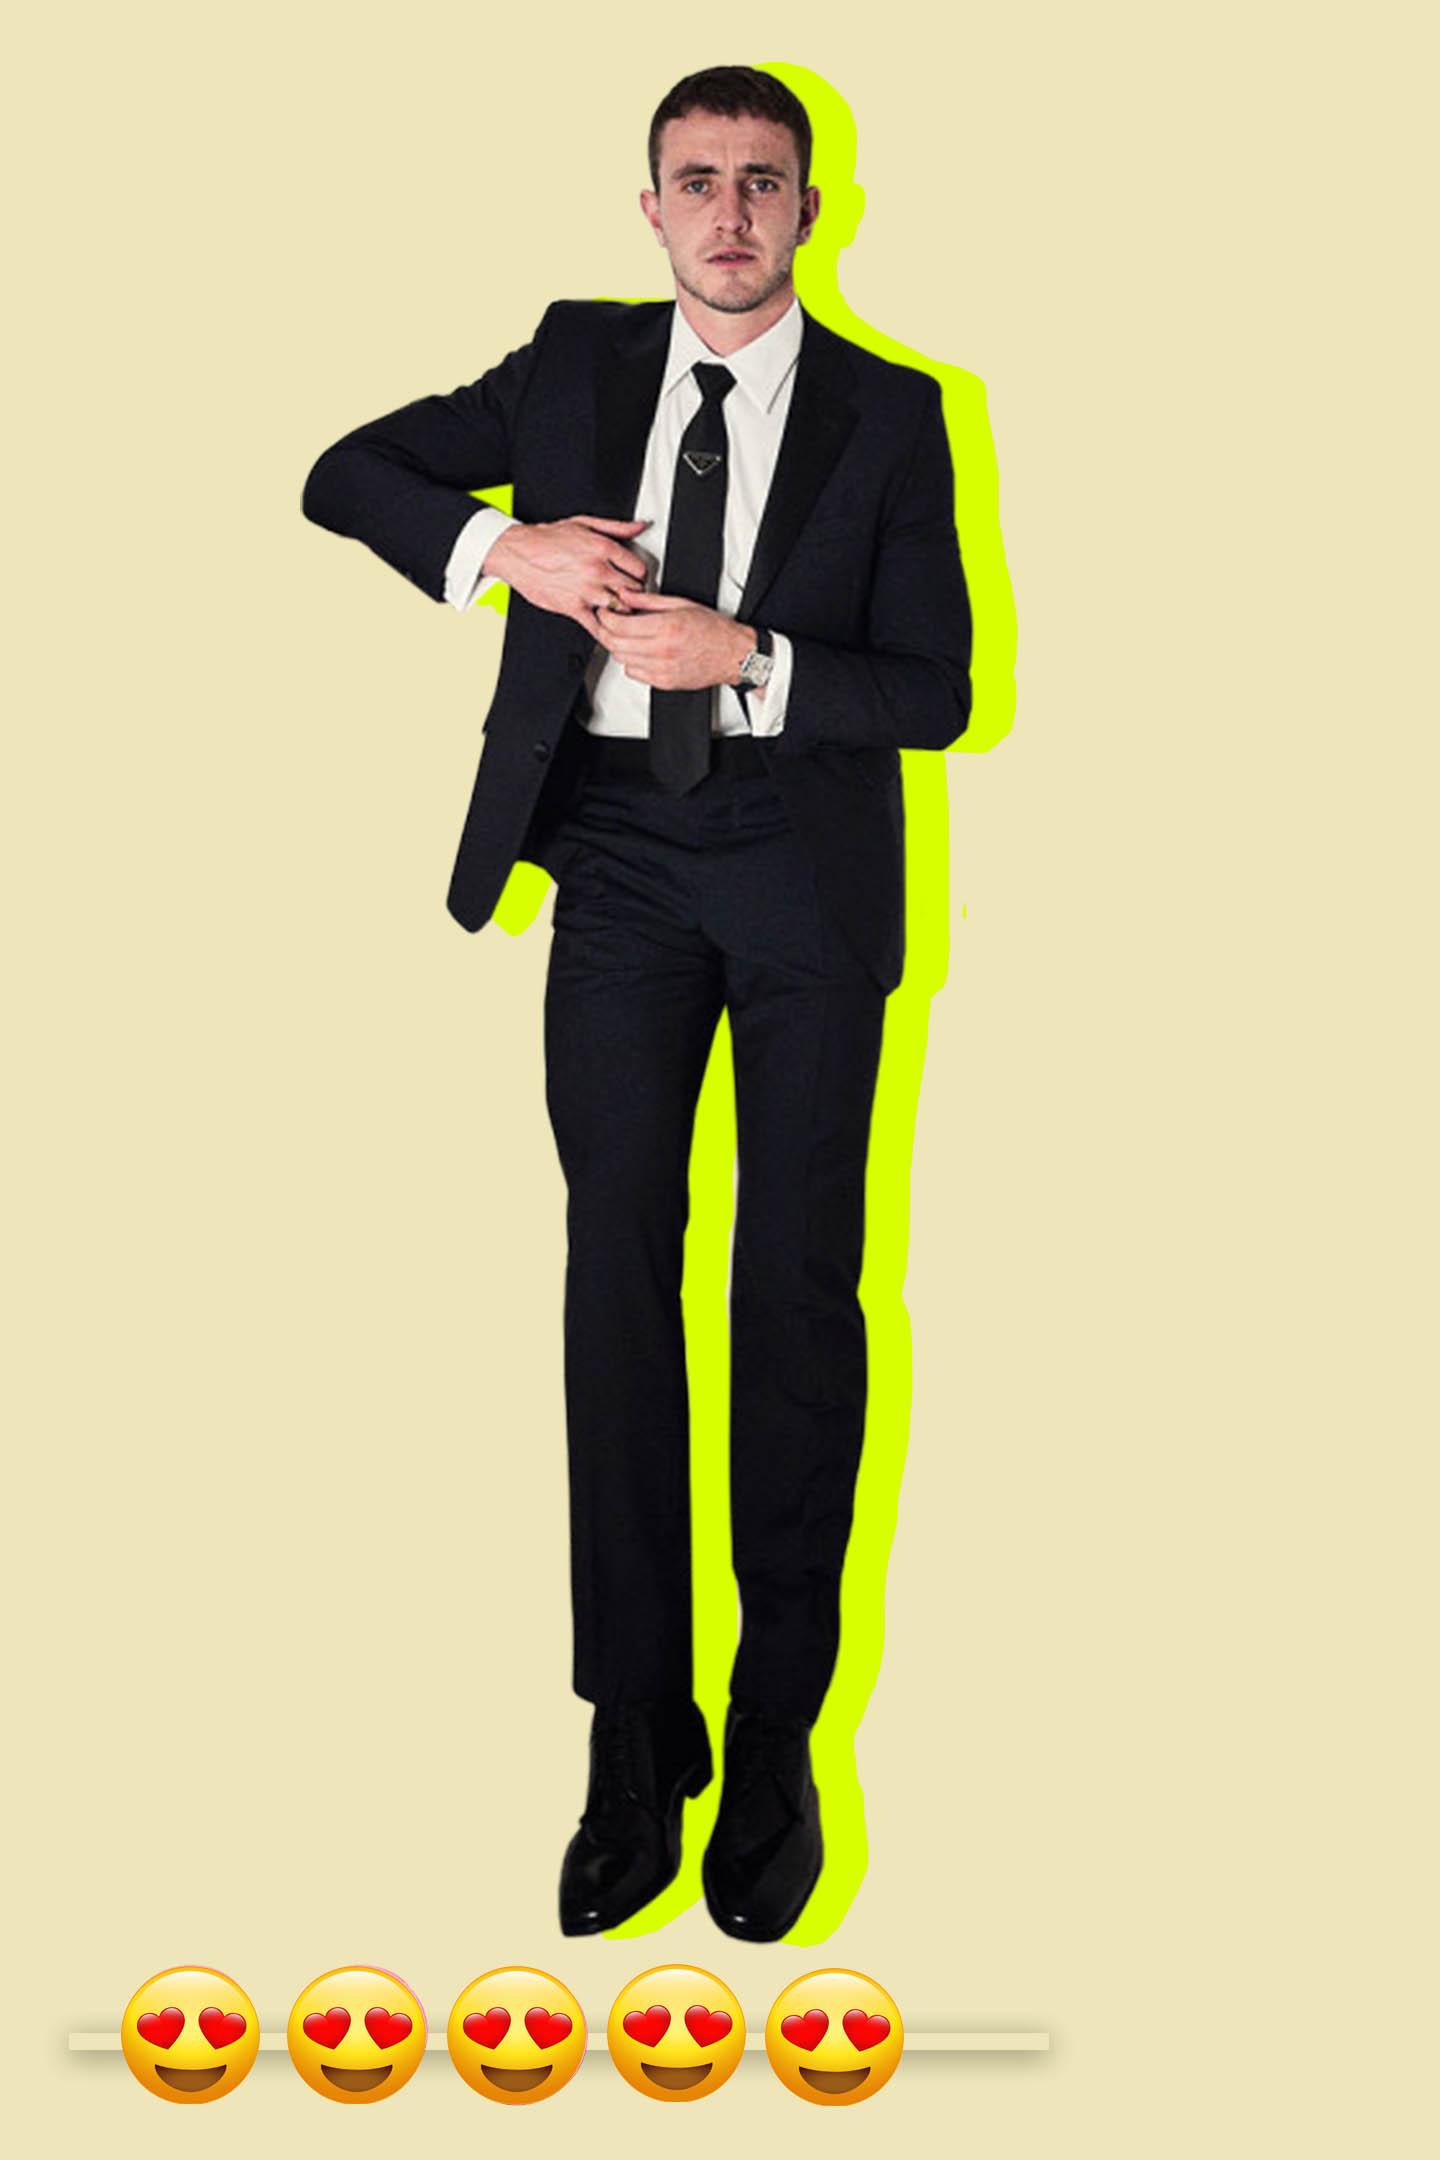 Paul Mescal in Prada at the 2021 Critics Choice Awards.